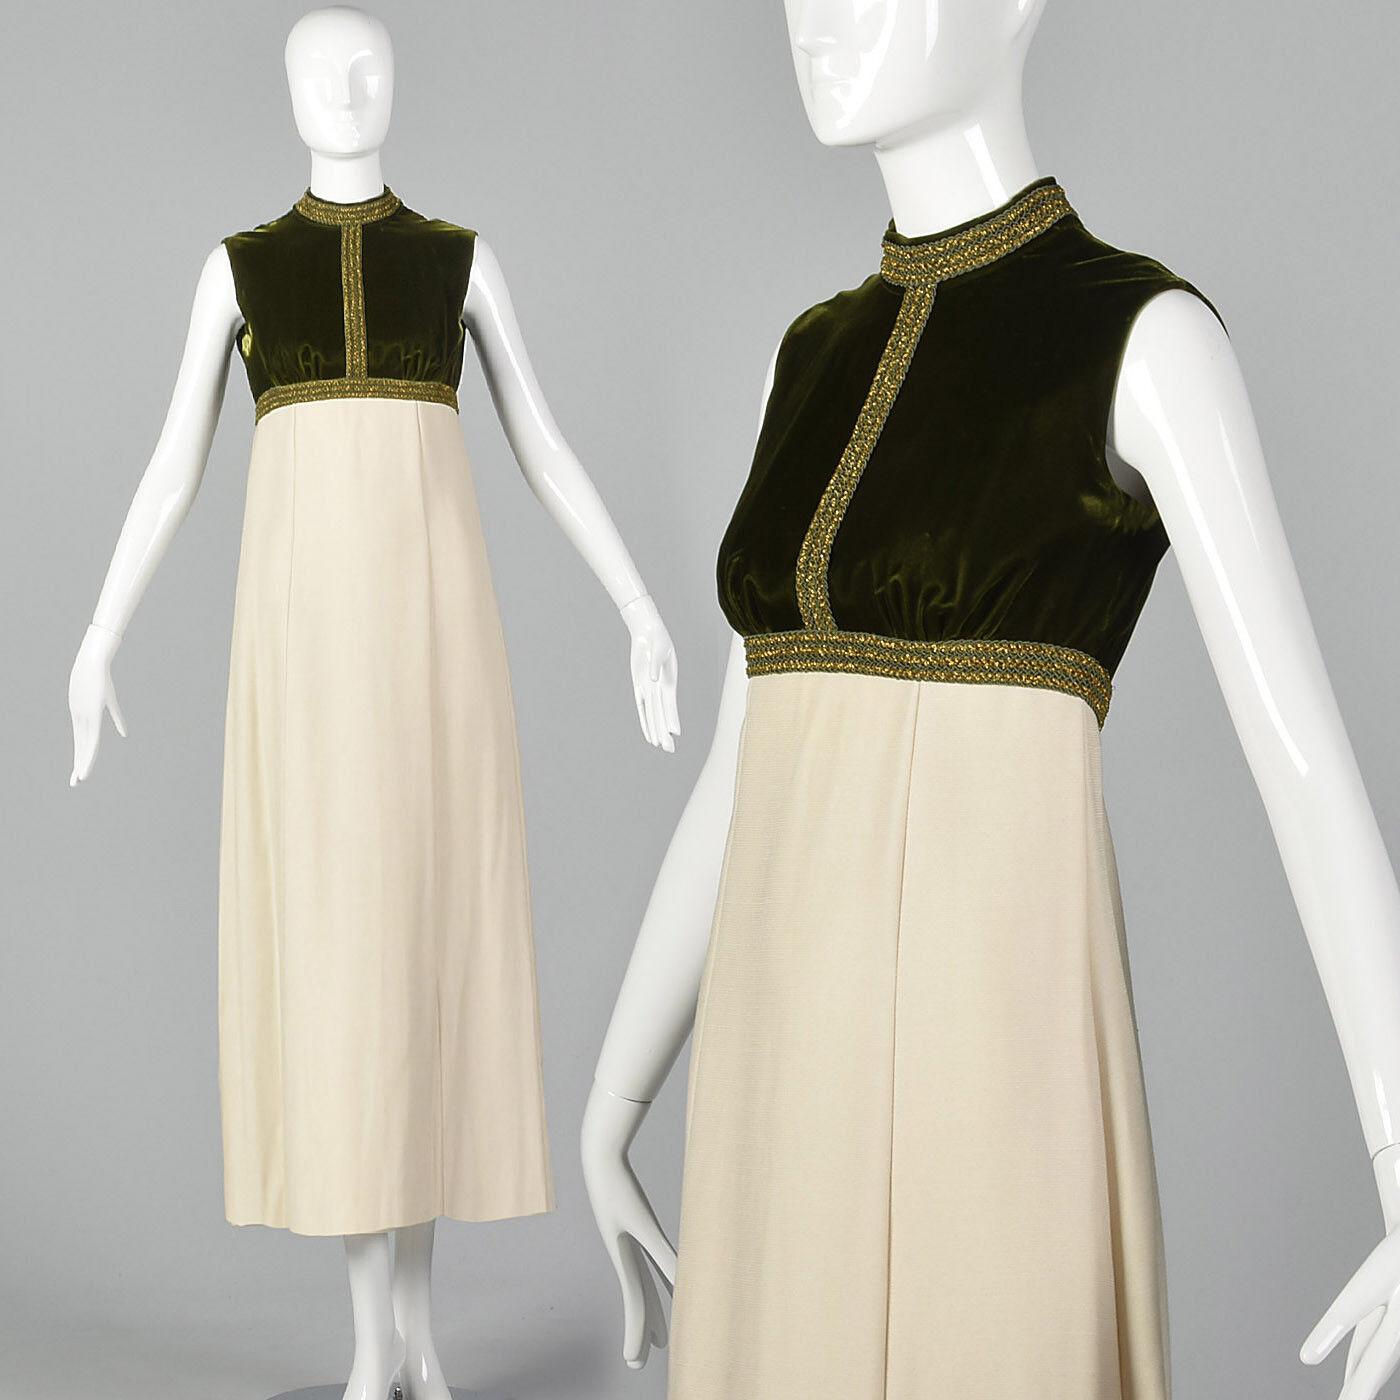 XXS 1960s Grün and Ivory Formal Dress Empire Waist VTG Formal Prom Dress